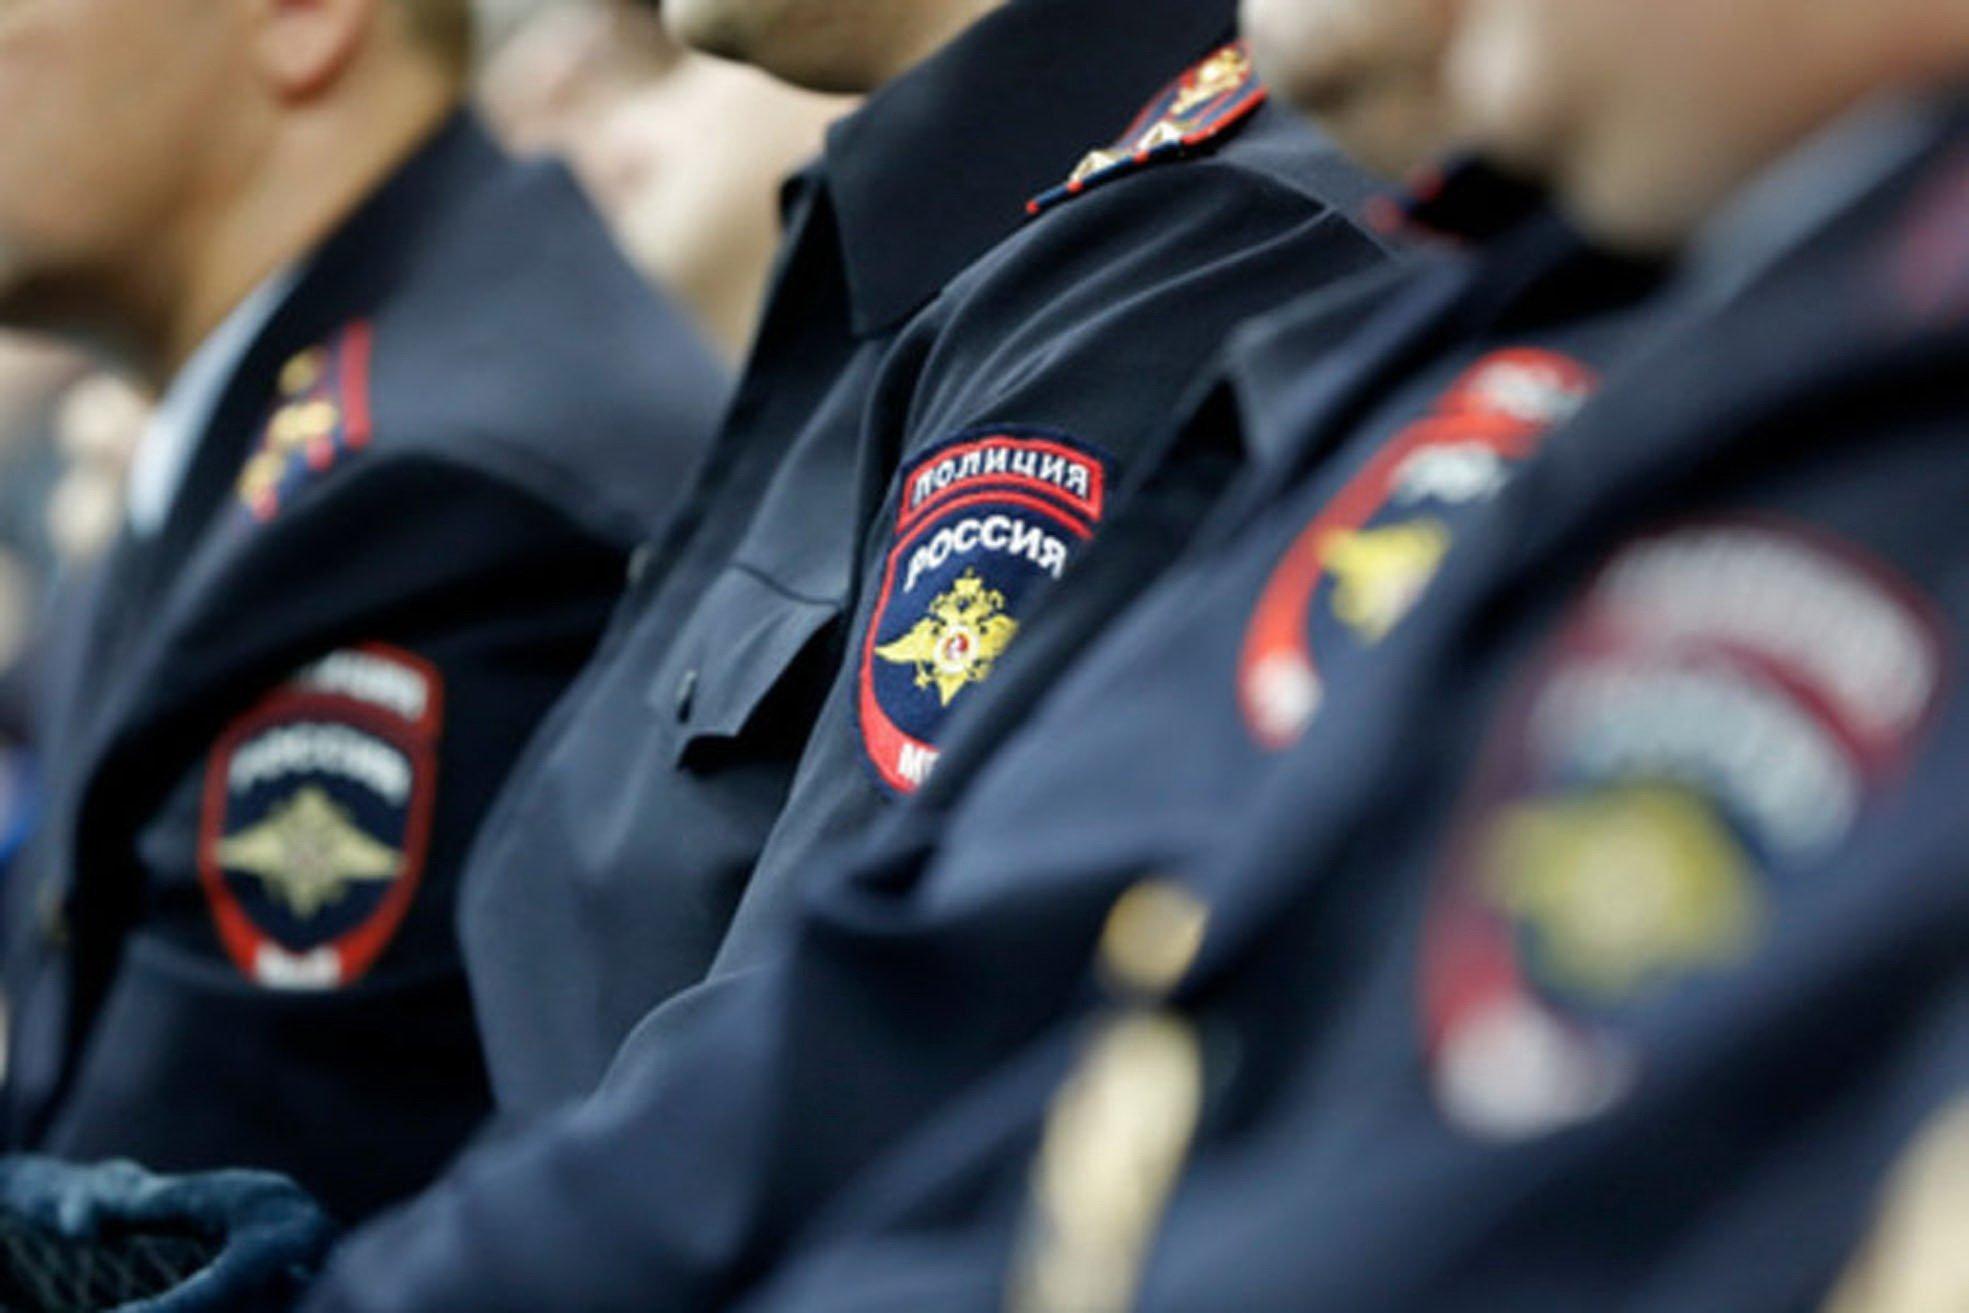 Права полиции - законопроект